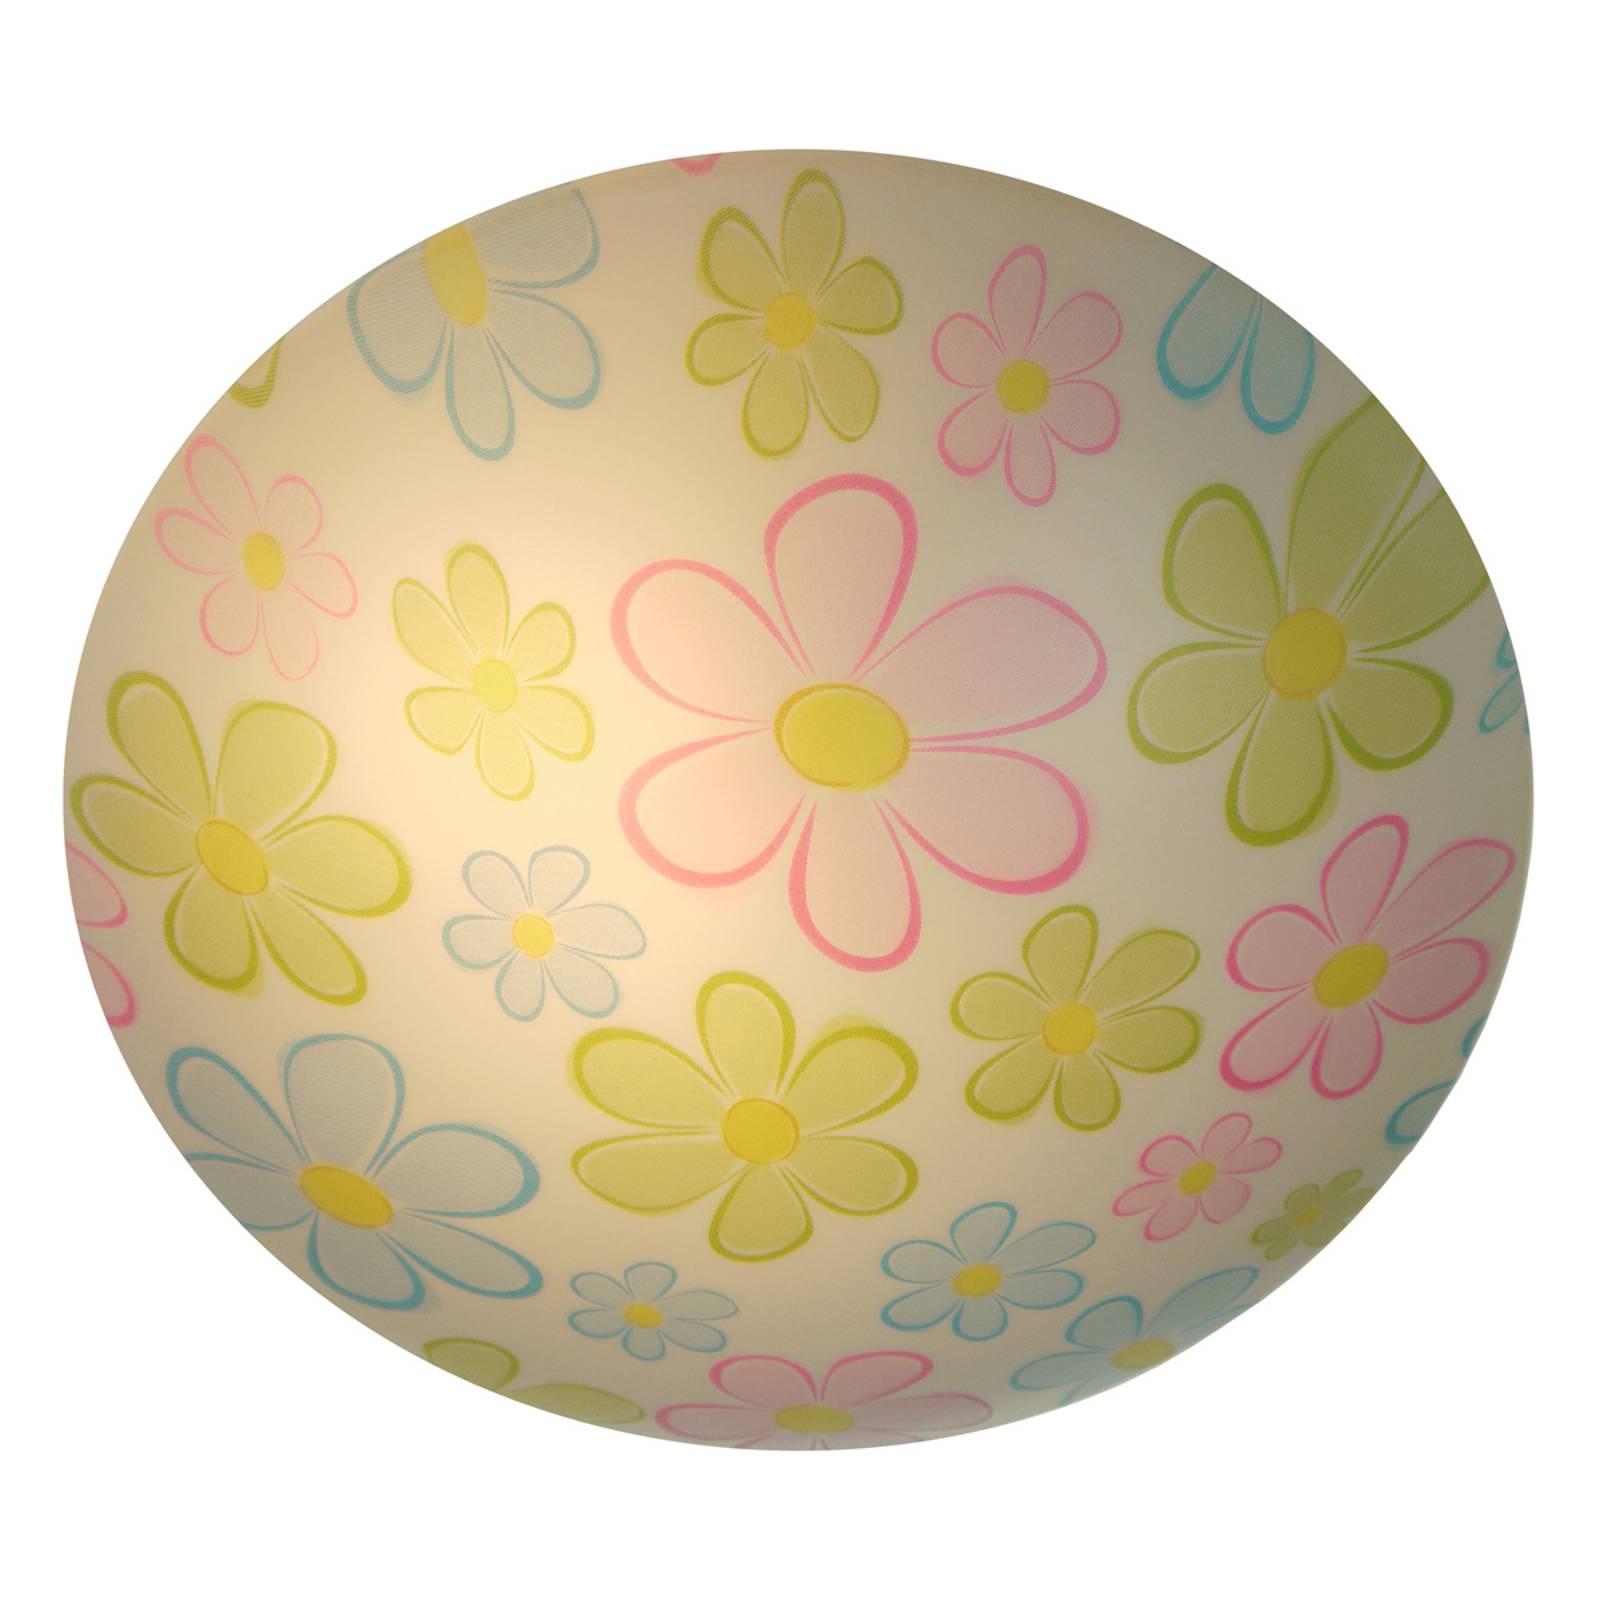 Ronde kinder-plafondlamp kleurrijke Bloemen